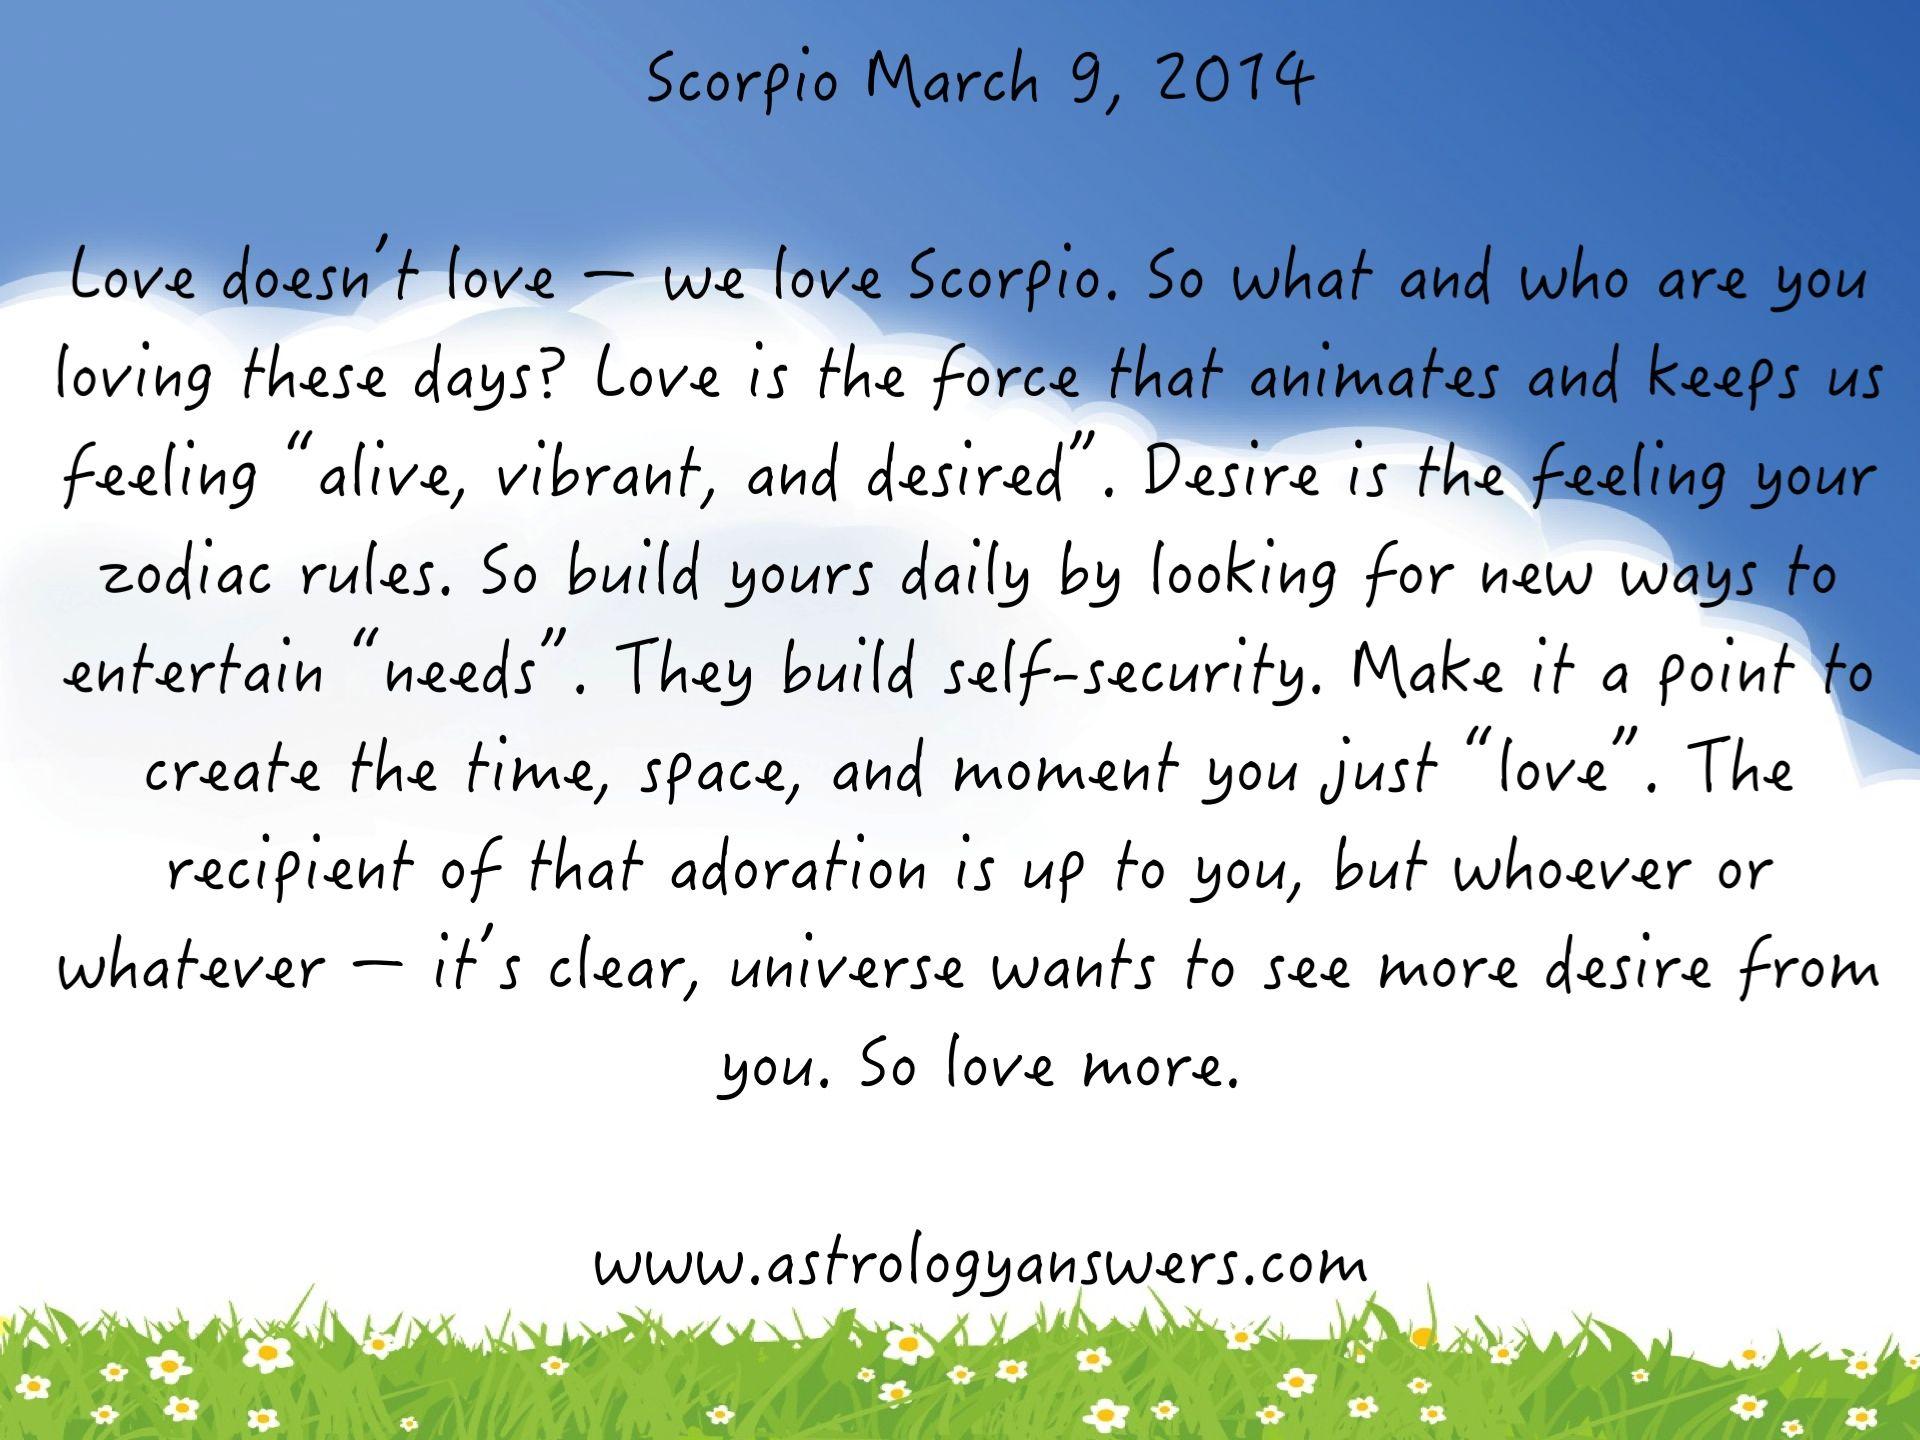 scorpio daily horoscope scorpio horoscope saturday 15th march 2014